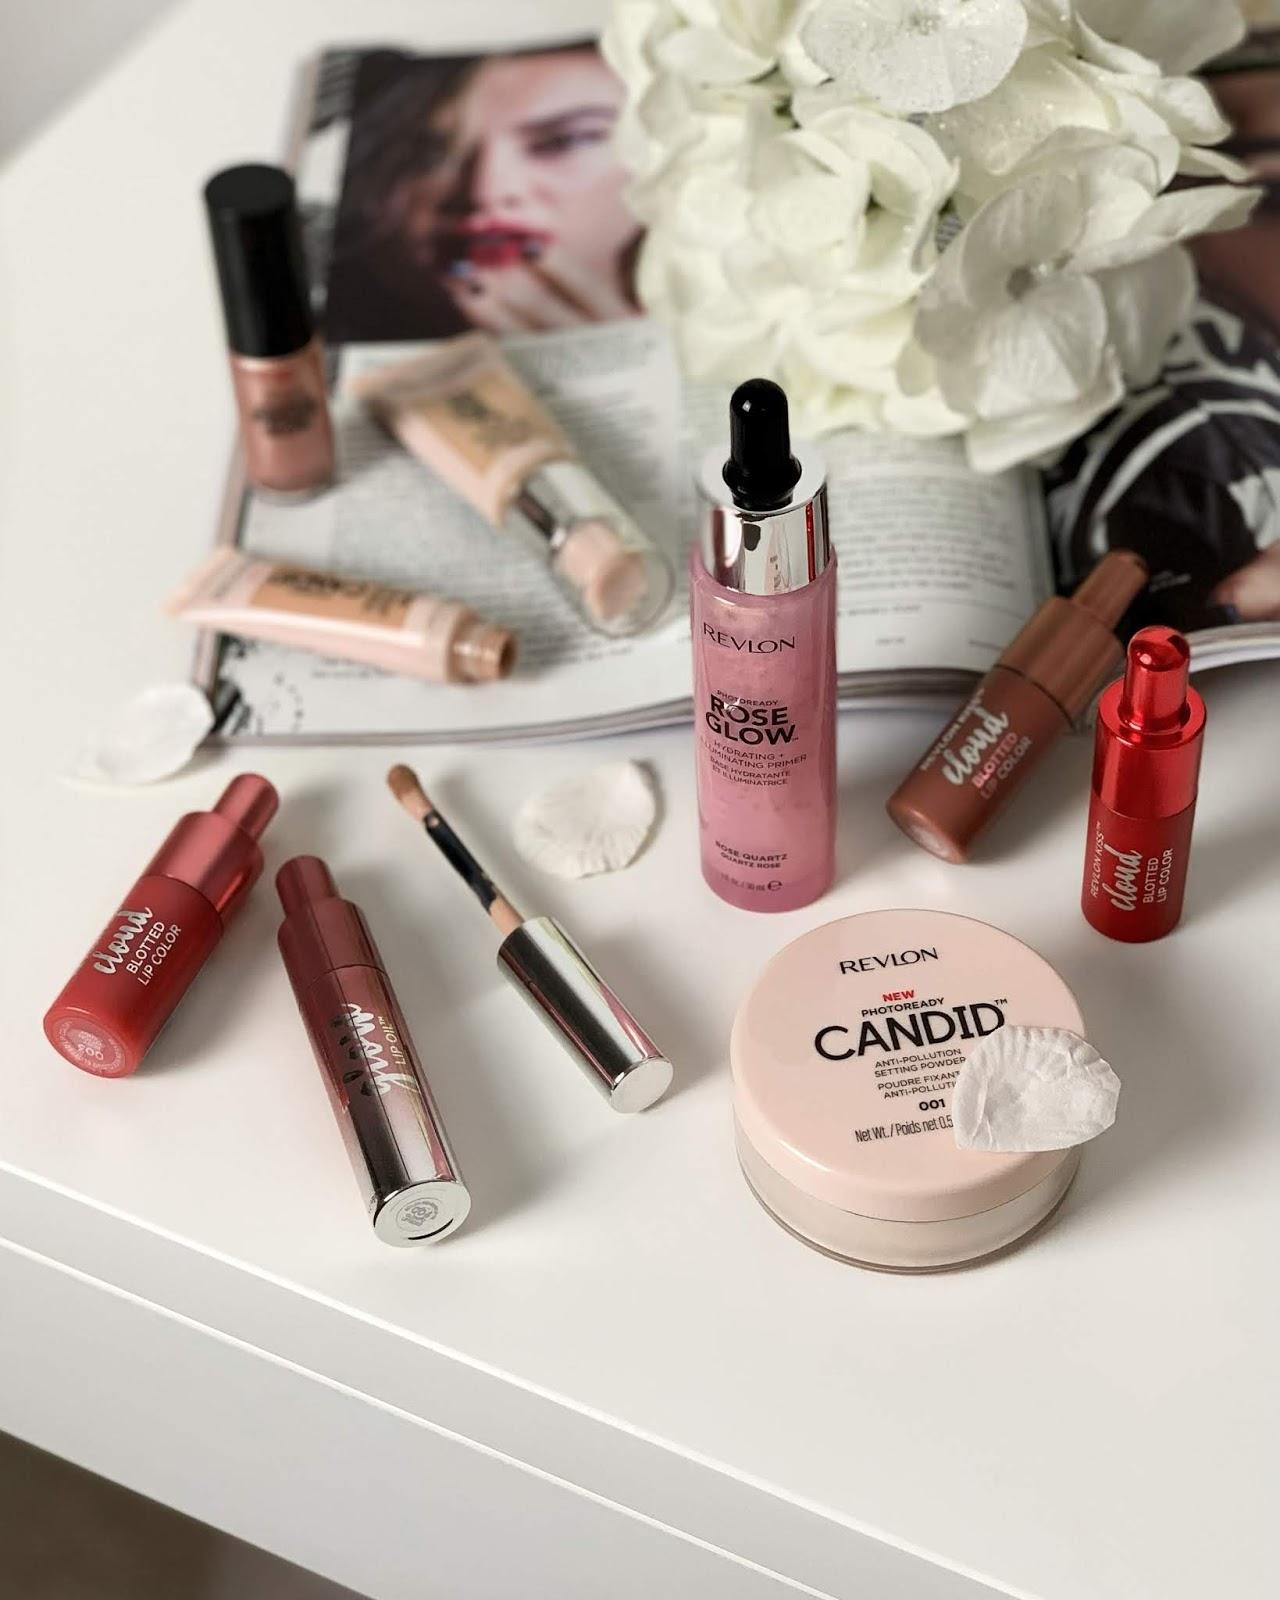 new makeup from revlon 2020